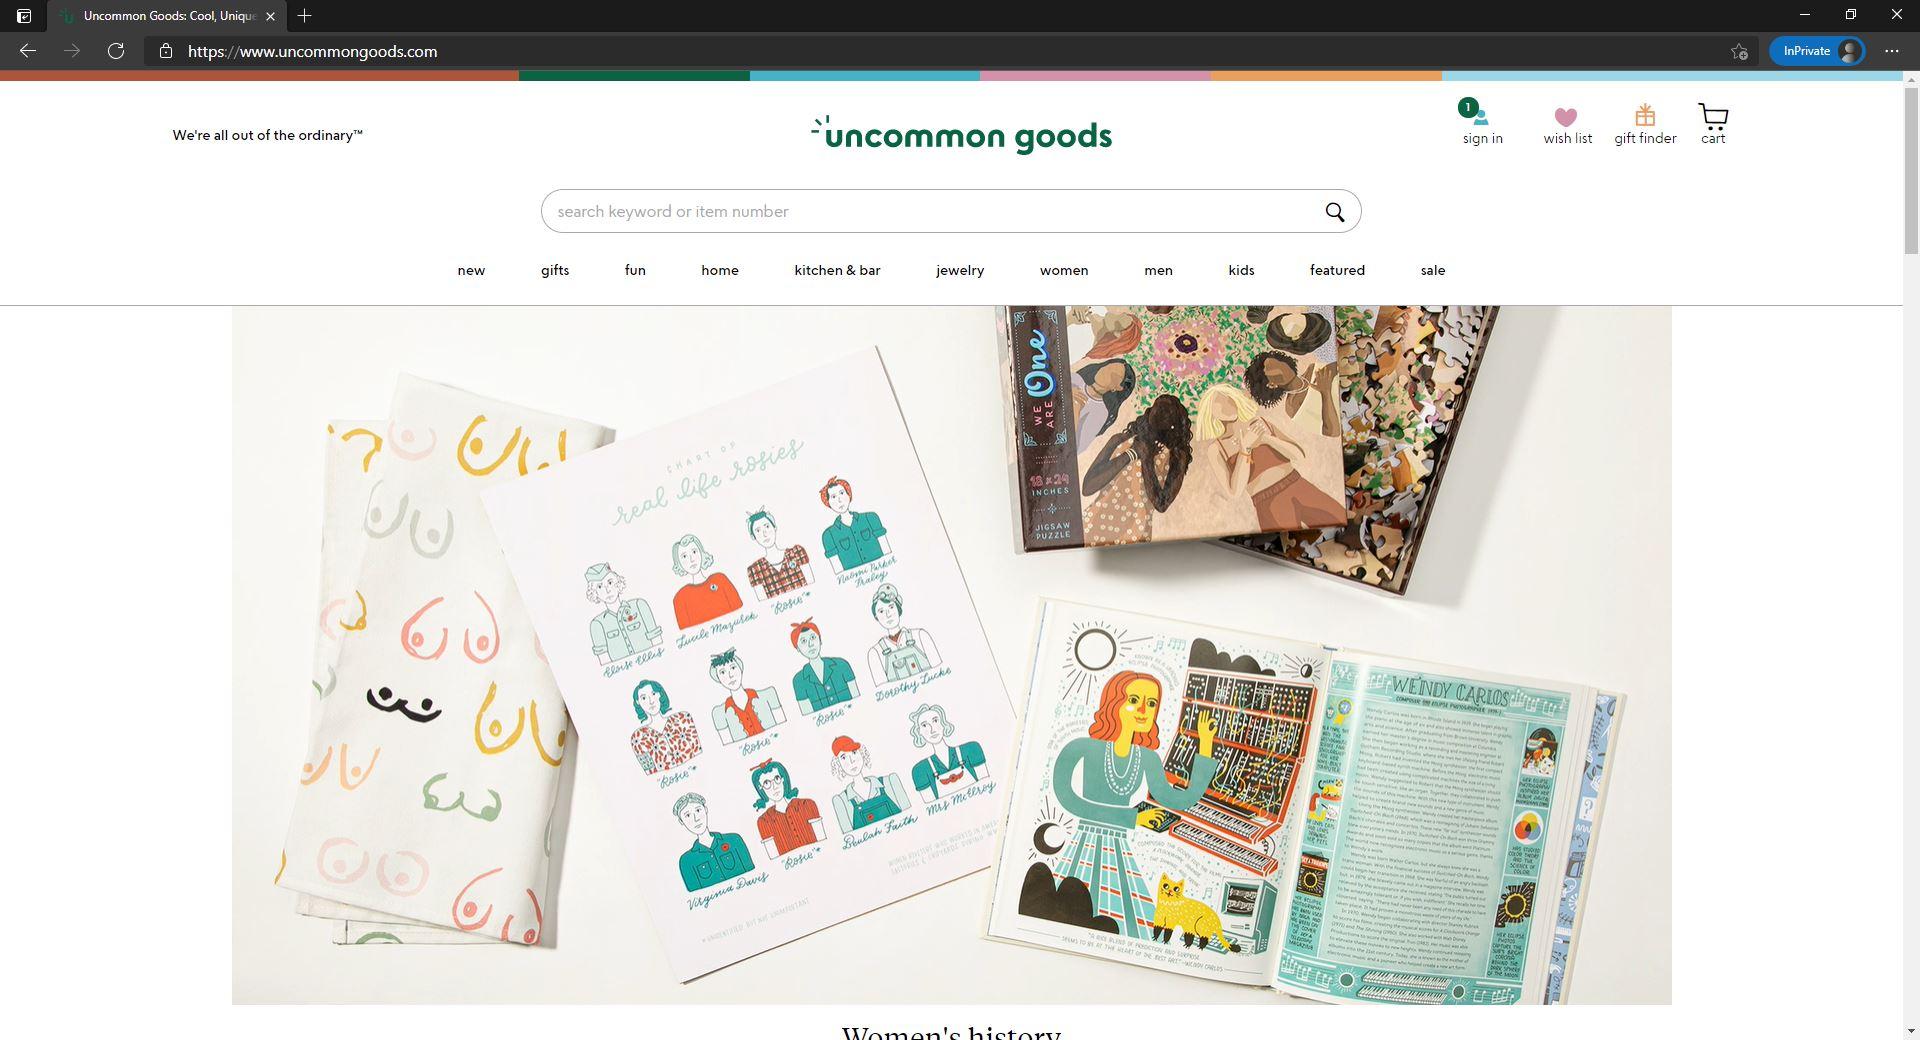 UncommonGoods website homepage